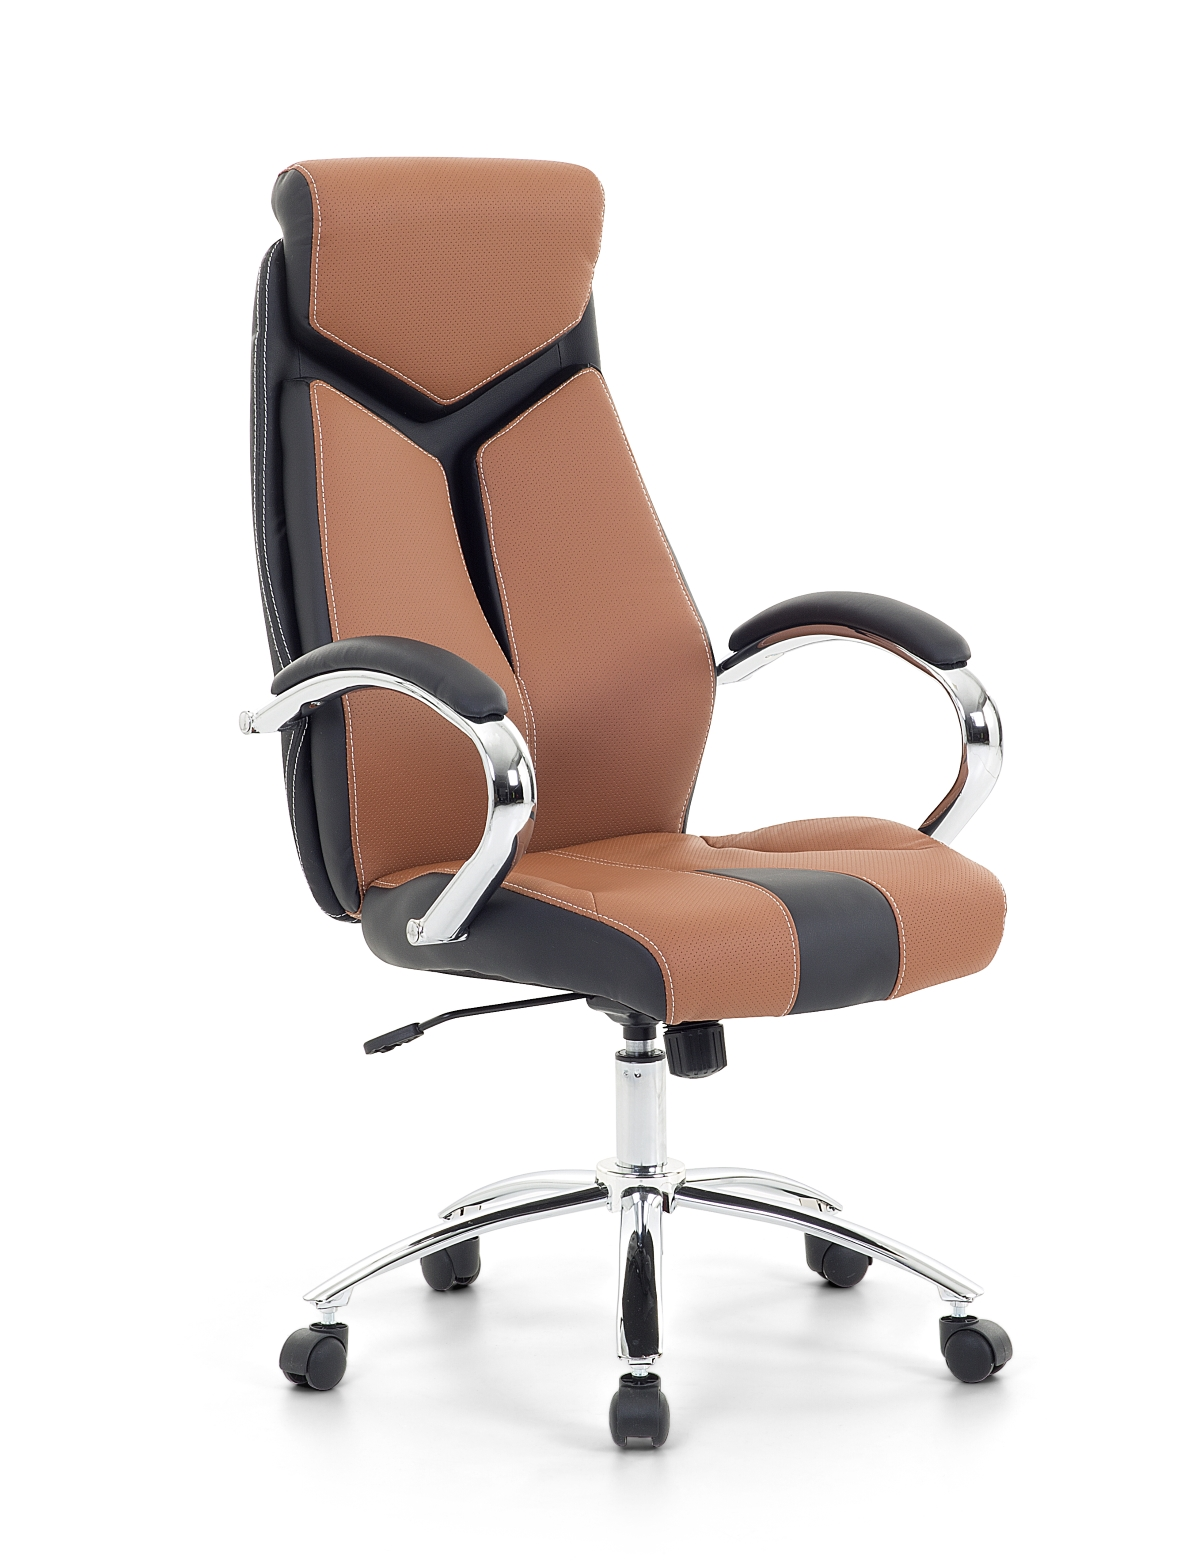 Bürostuhl weiß braun  Racing Chefsessel Bürosessel Bürostuhl bequemer Sessel braun ...